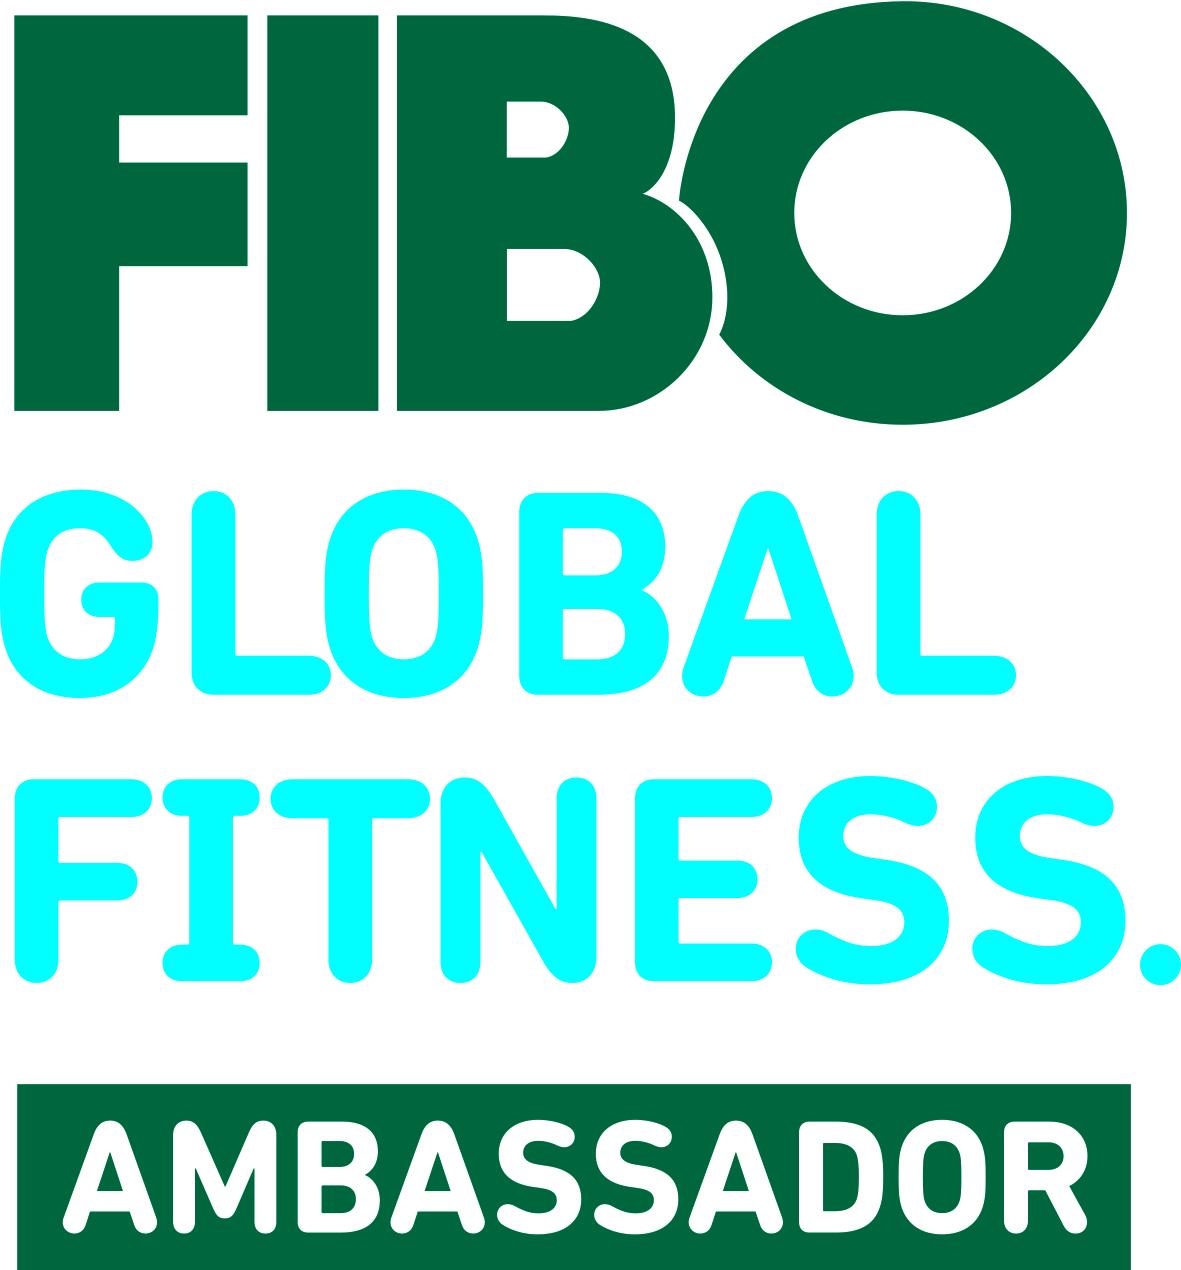 fibo_ambassador_logoclaim_pos-2.jpg